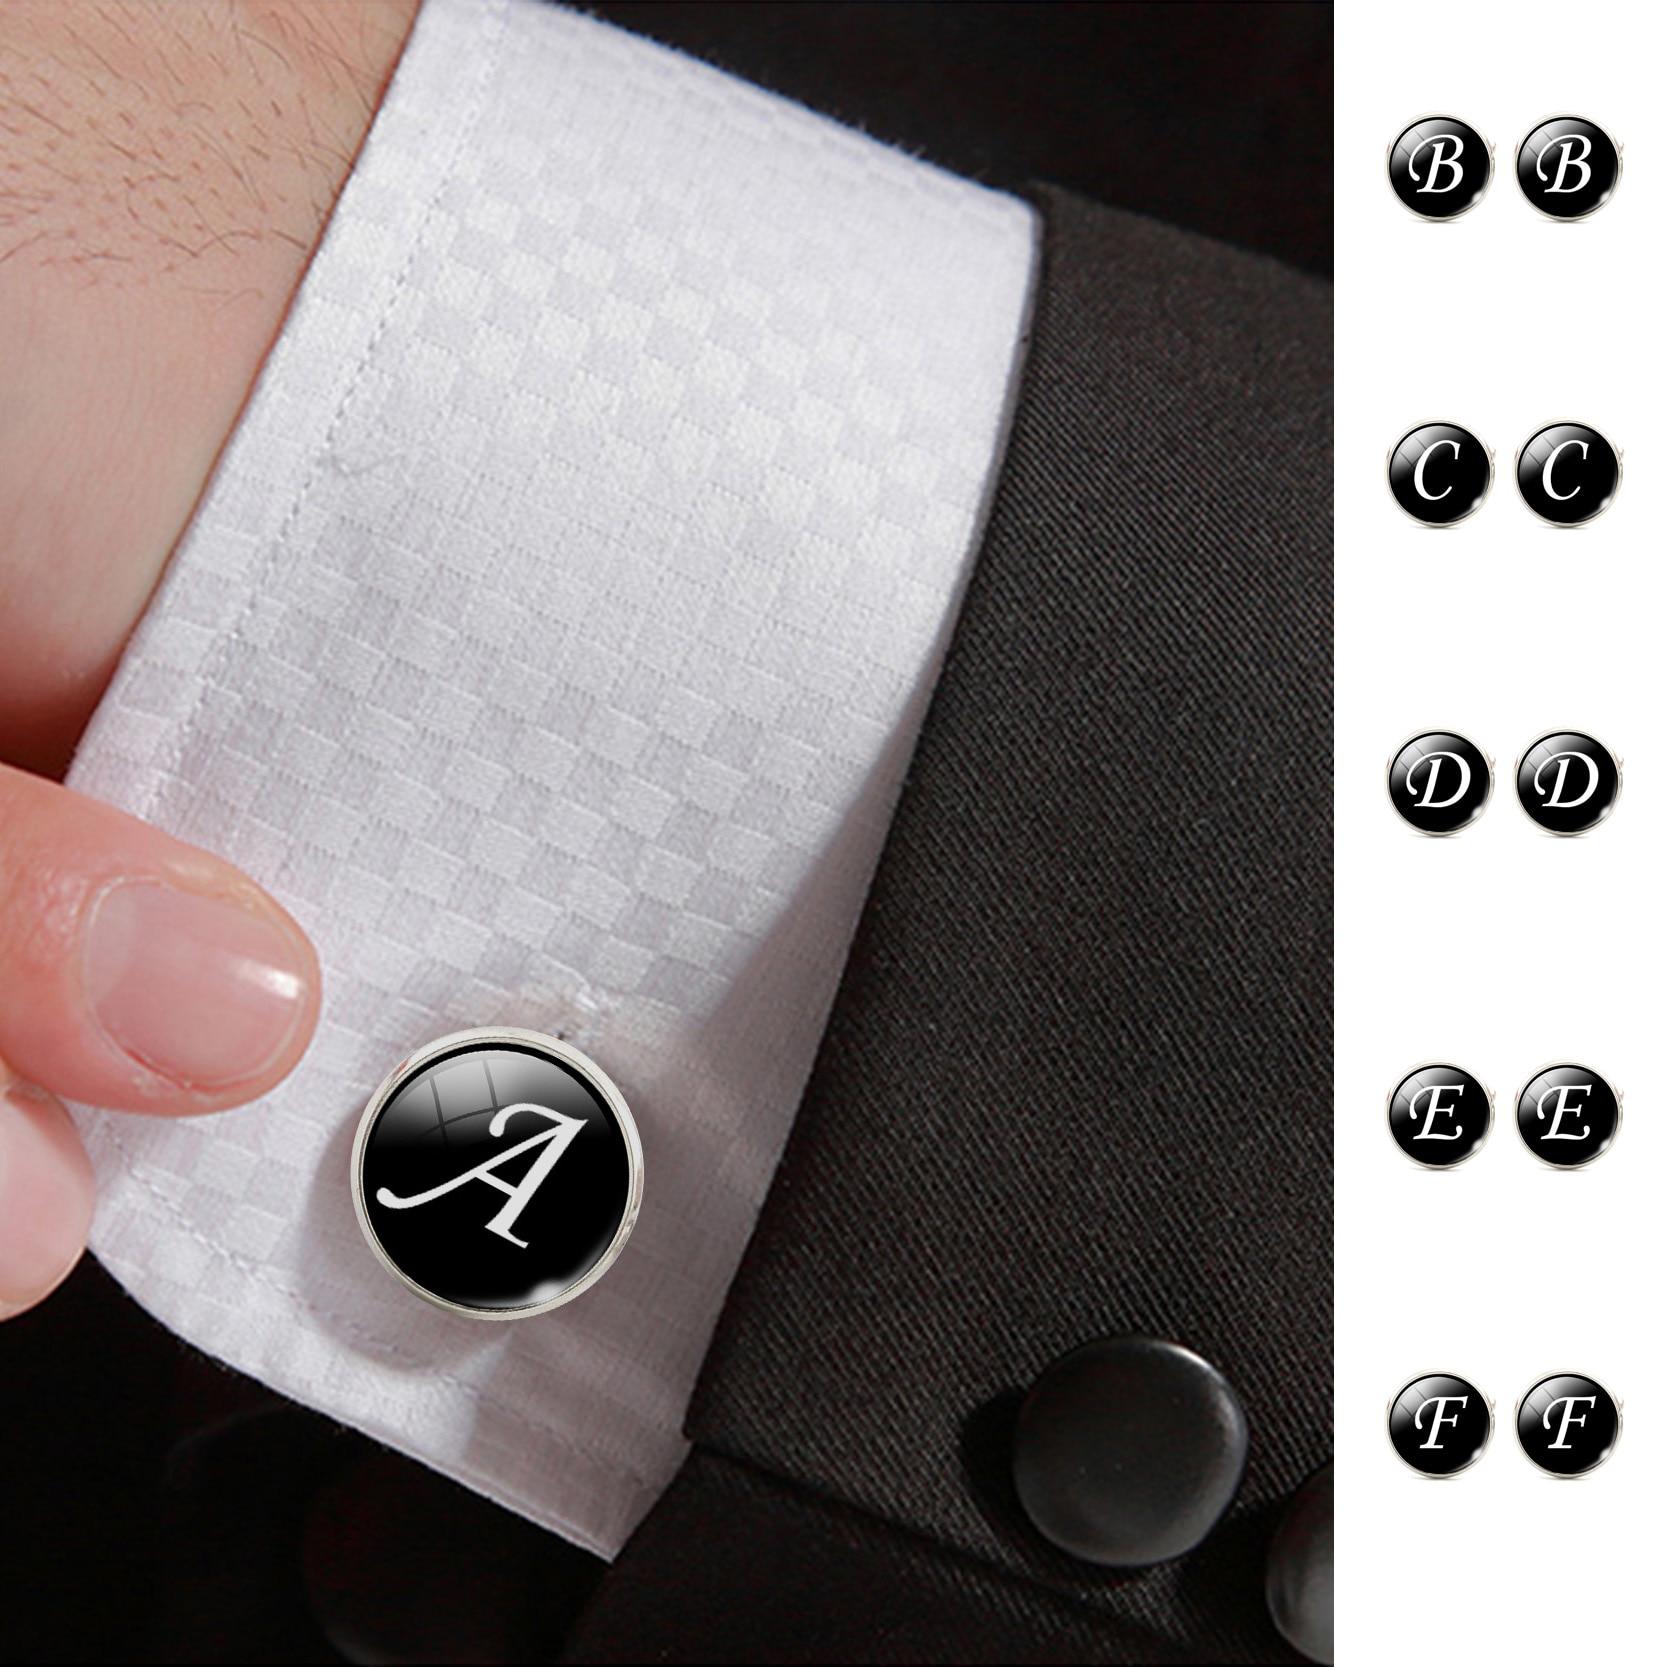 fashion jewelry men cufflinks alphabet single letter black bottom silver plated wedding party vintage 16mm men cuff link 2017